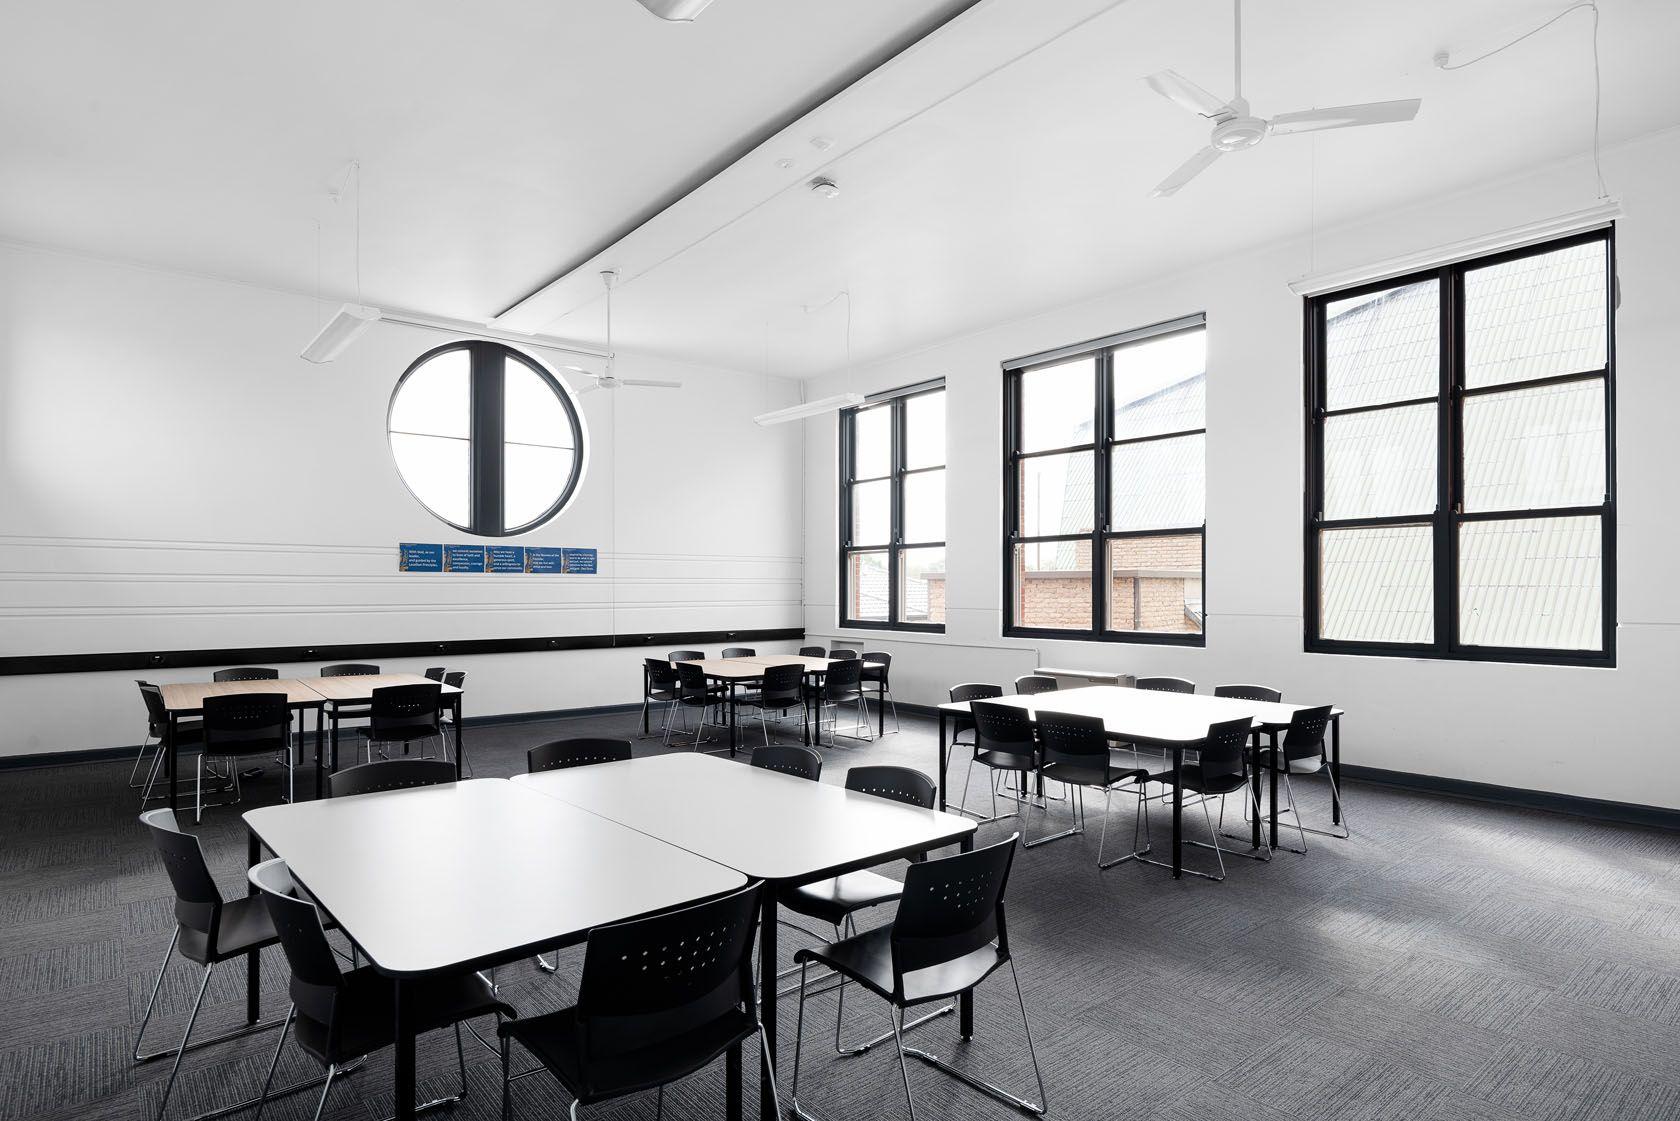 de la salle college classroom